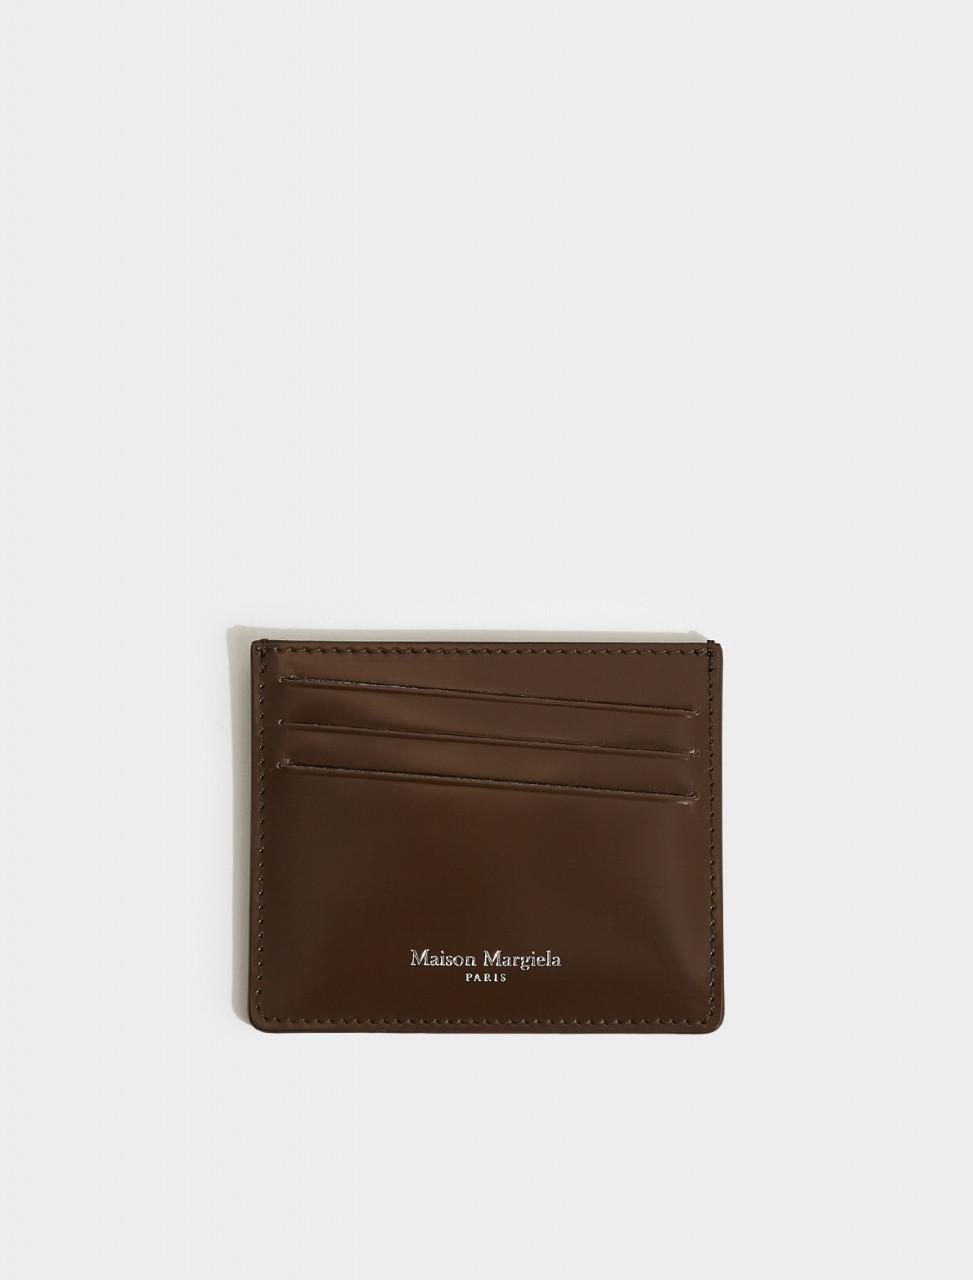 S35UI0432-T2149 MAISON MARGIELA CARD HOLDER IN BROWN